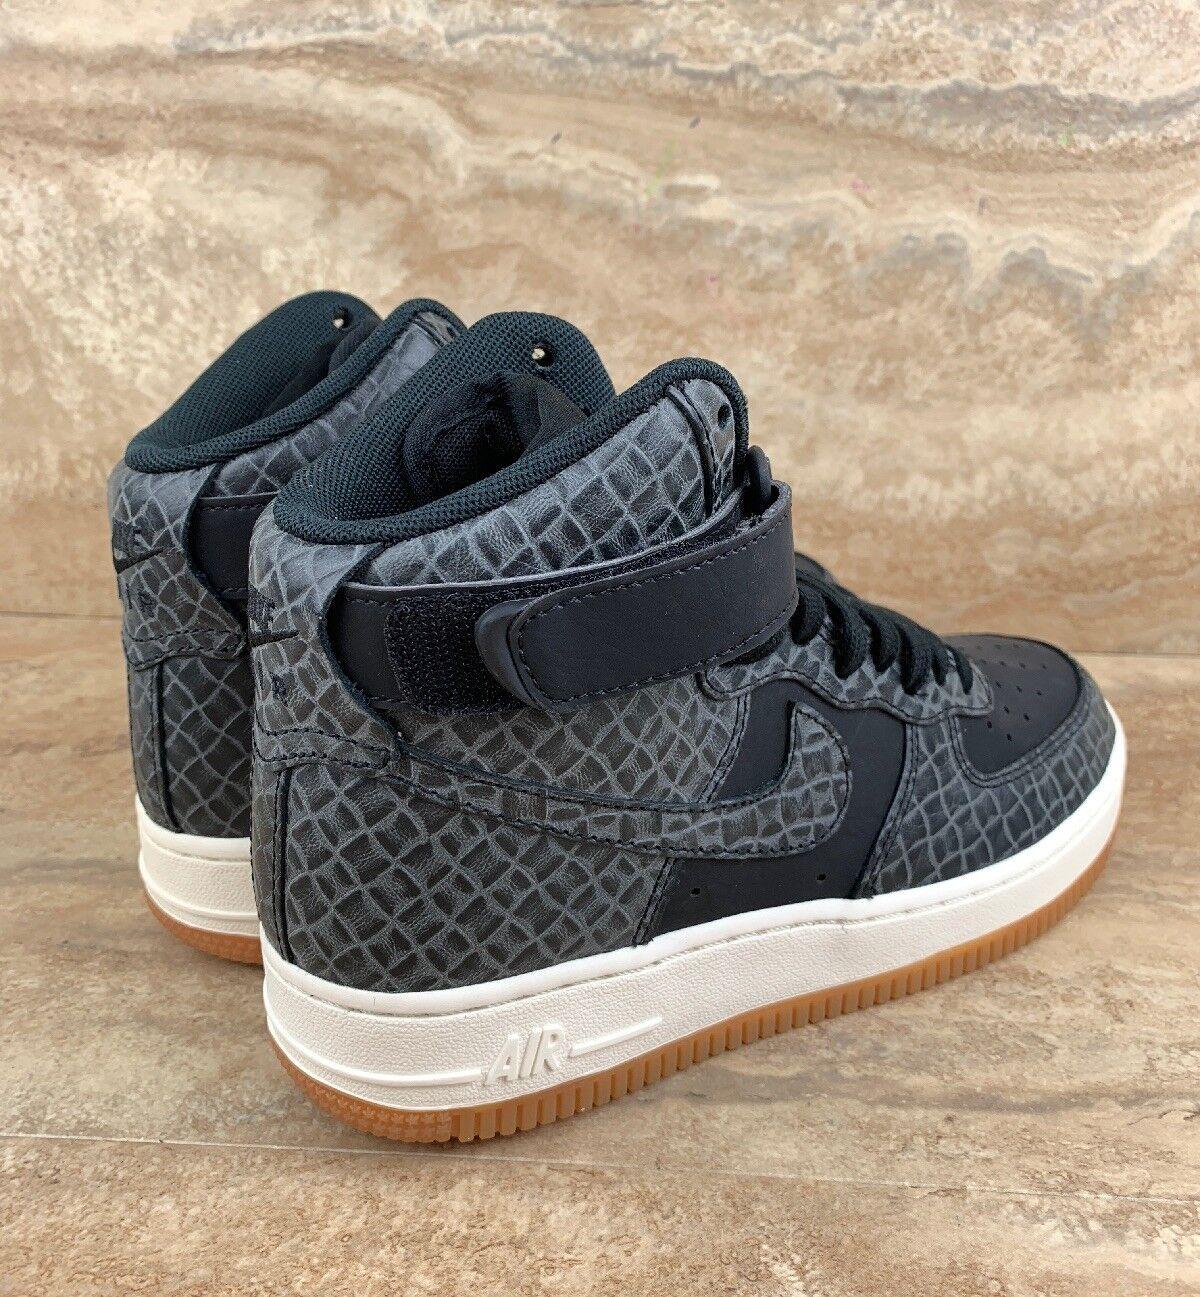 Nike Air Force 1 HI Premium Women's Women's Women's Basket Ball shoes Black Sail Gum 090a02